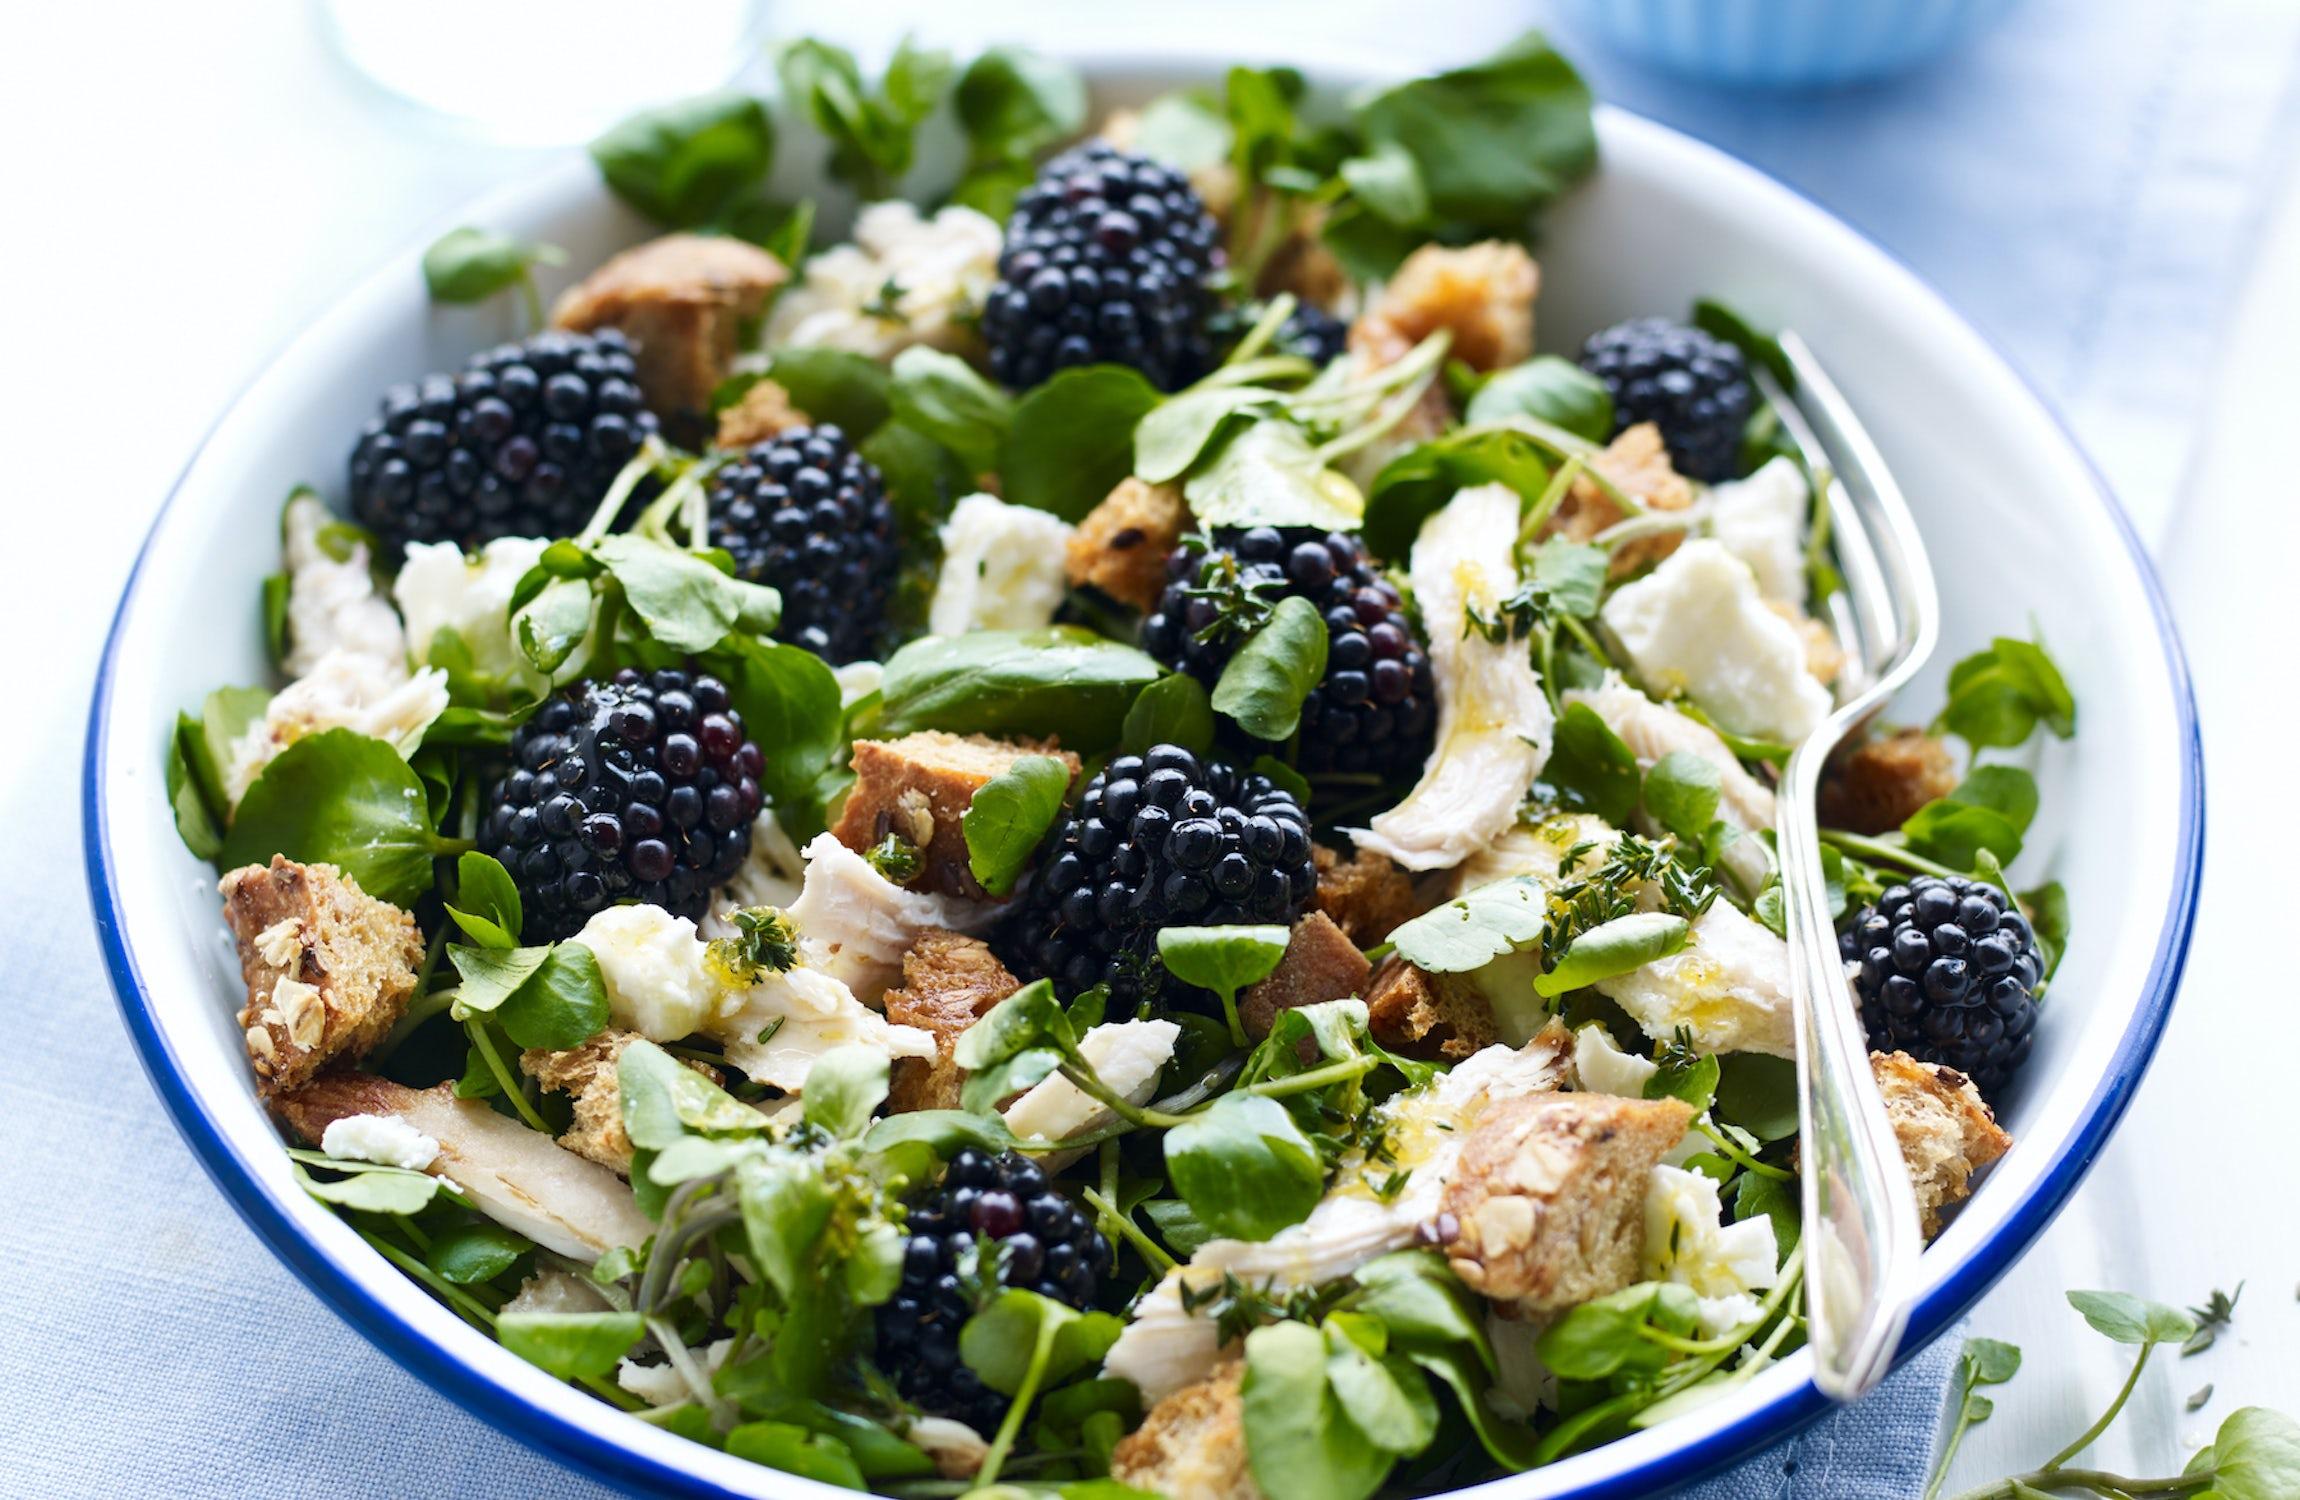 Special Chicken & Blackberry Salad